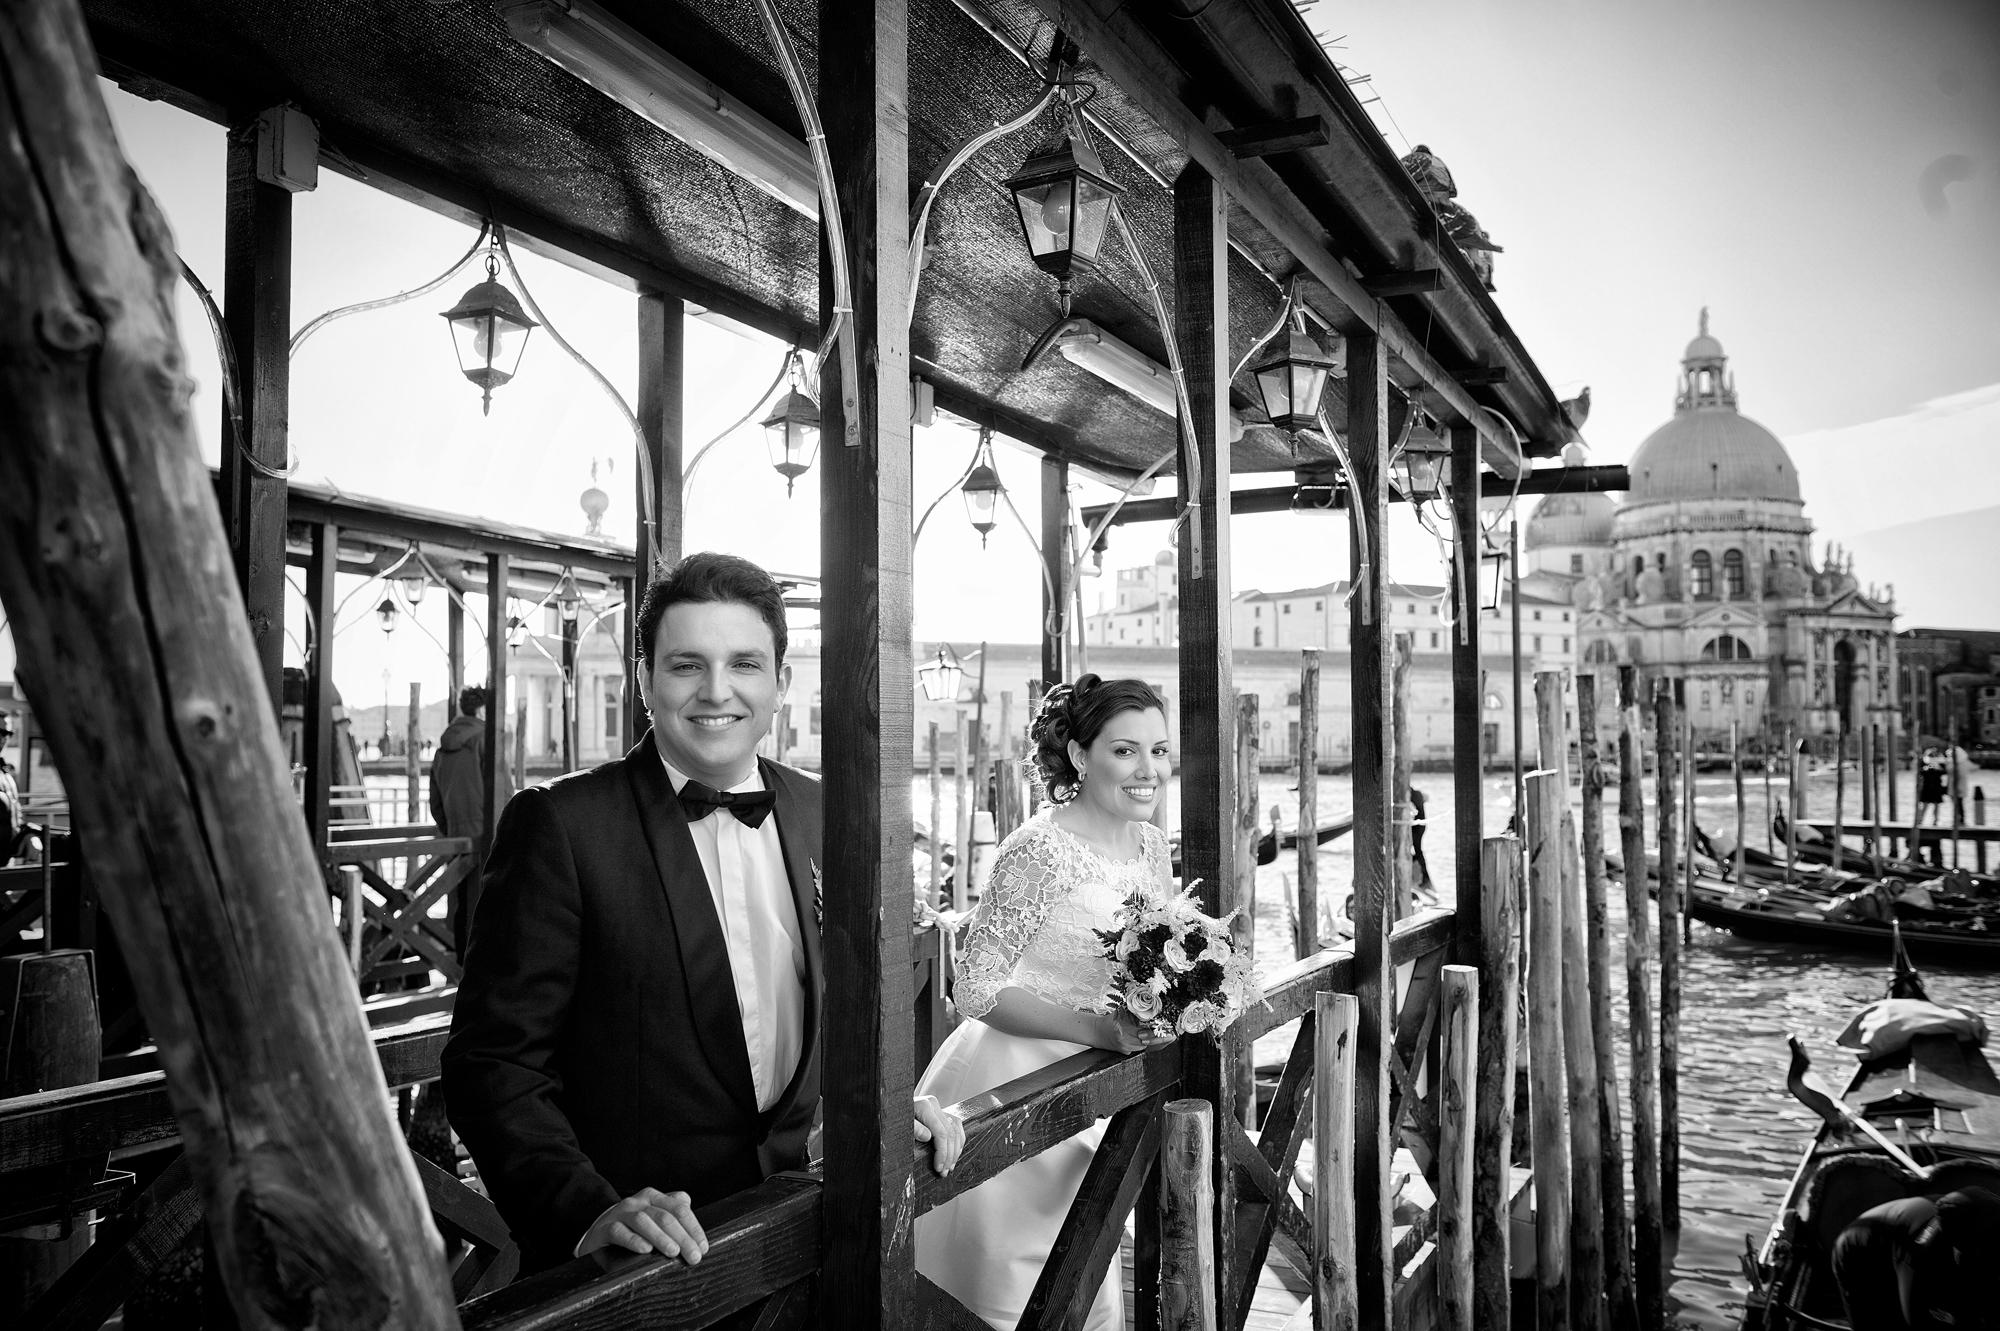 venezia matrimonio simbolico fotografia carmini laure jacquemin fotografo (71)